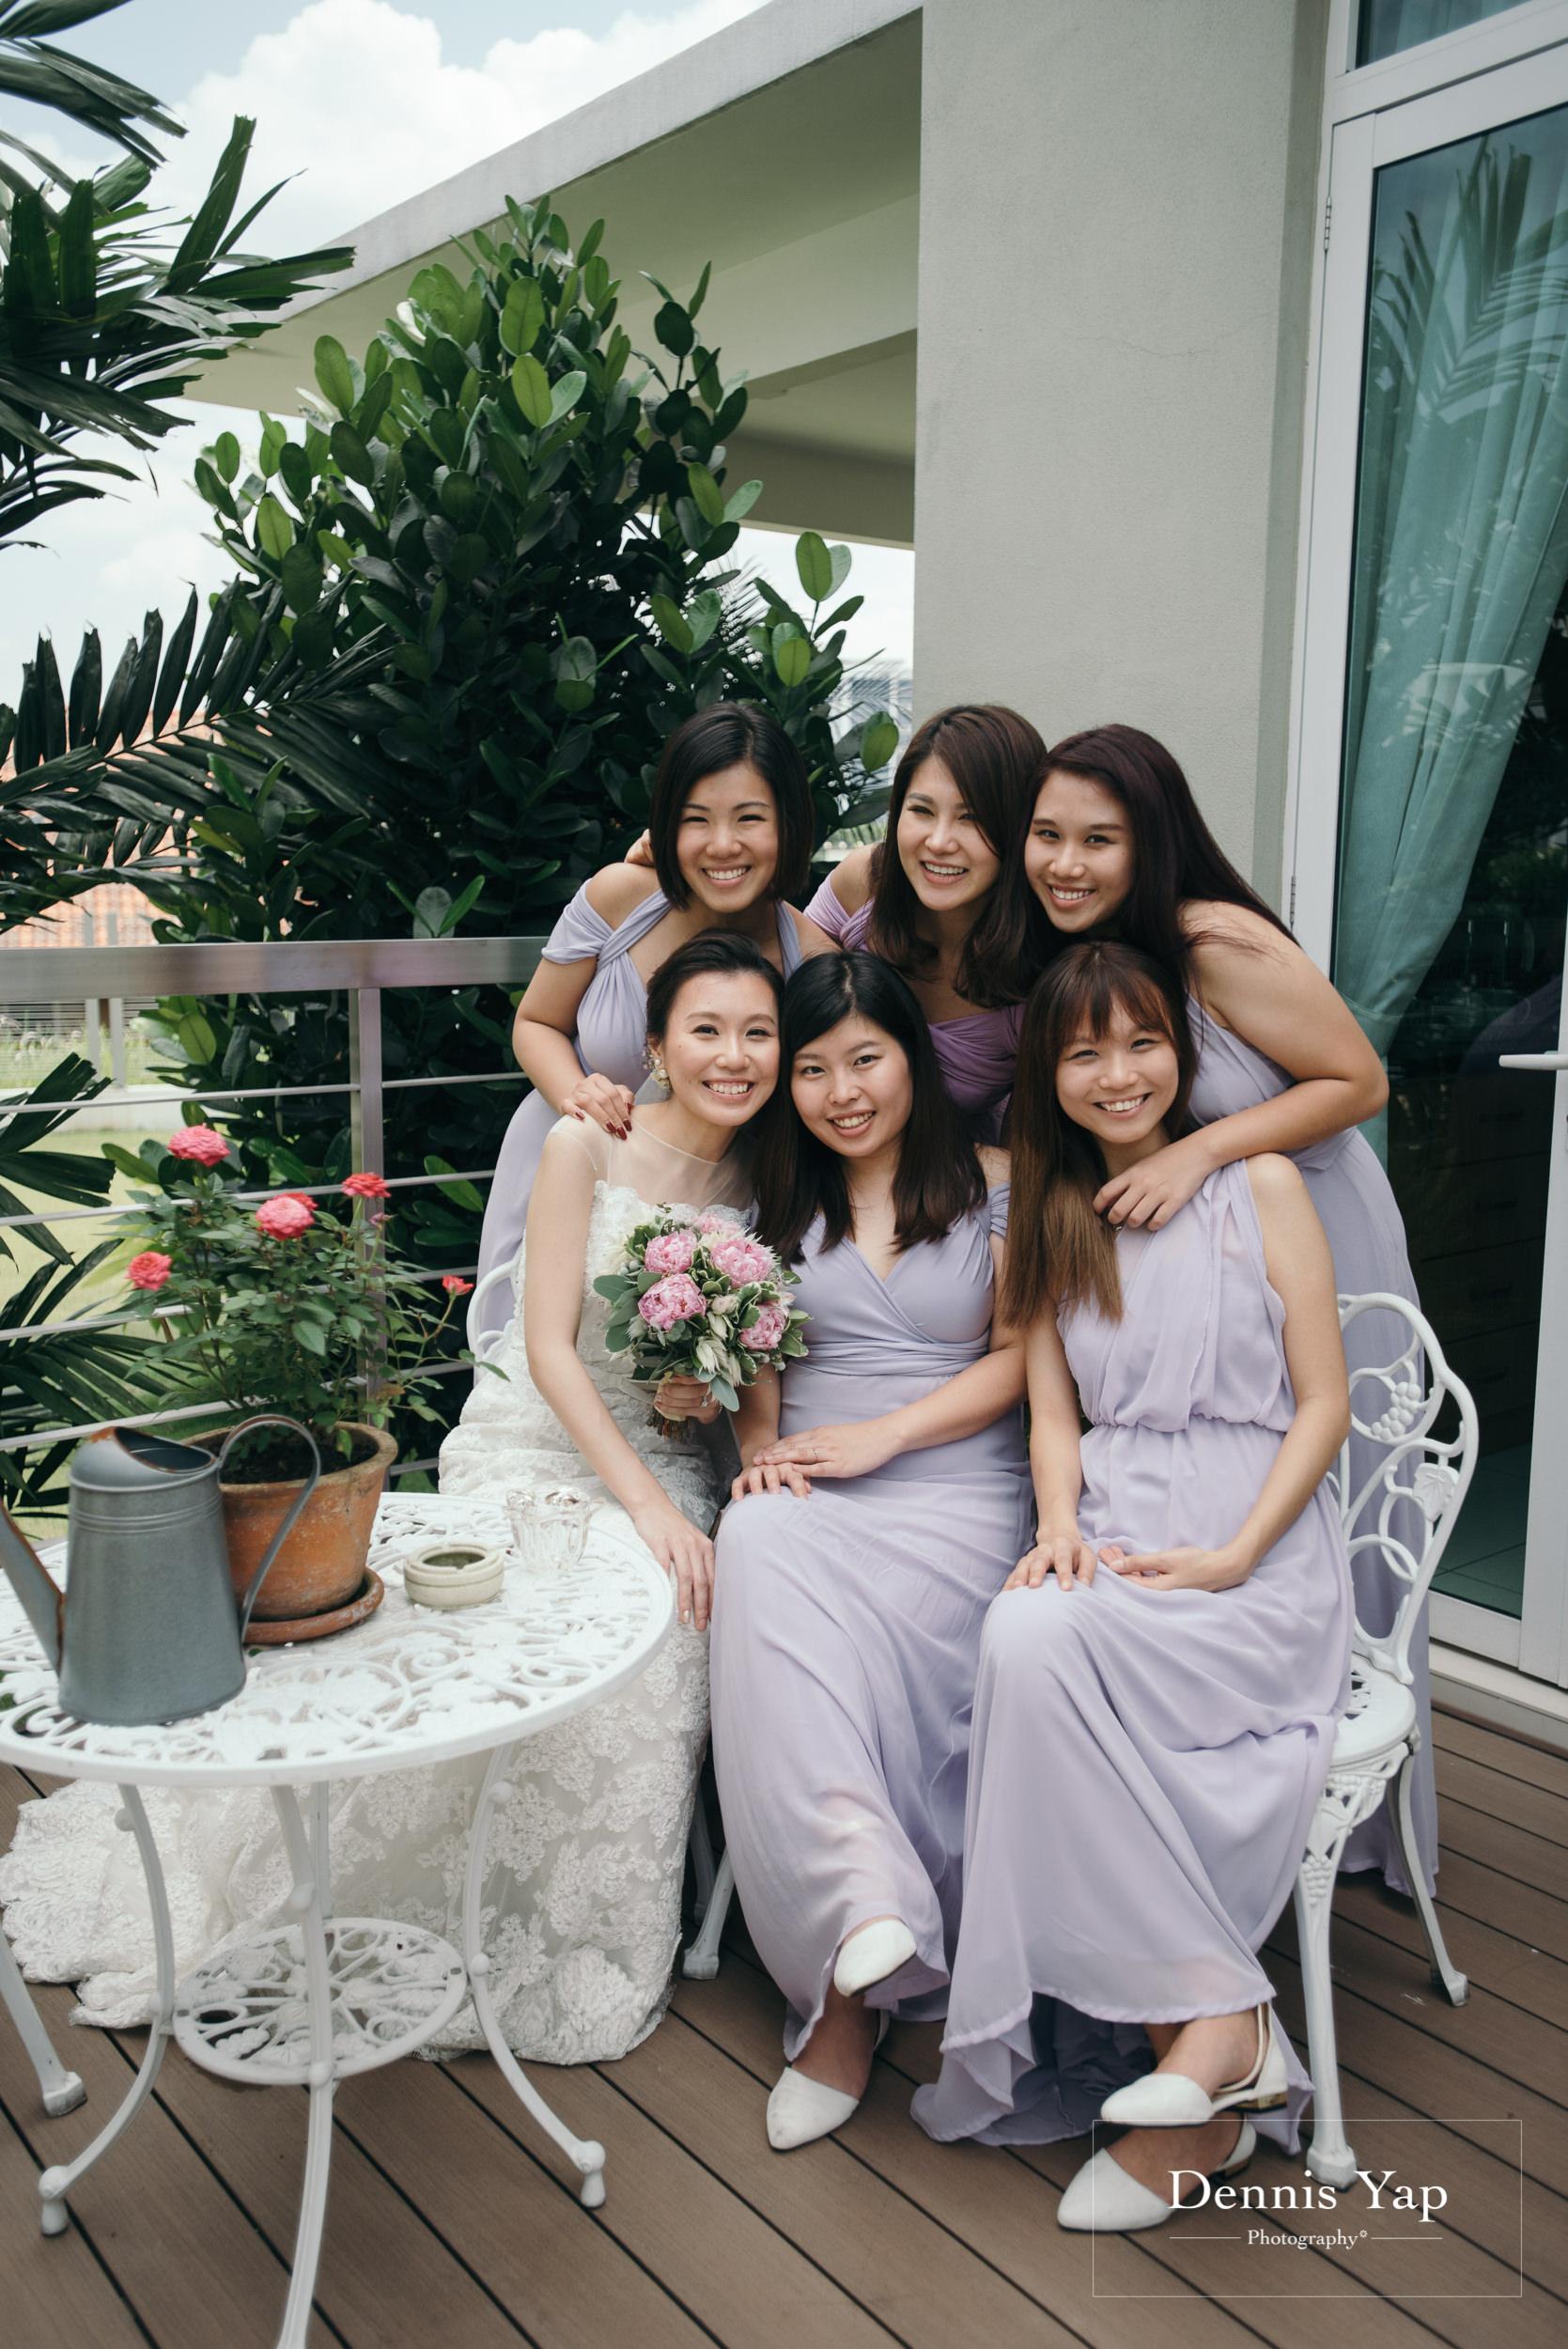 danny sherine wedding day group photo dennis yap photography usj heights malaysia top wedding photographer-18.jpg